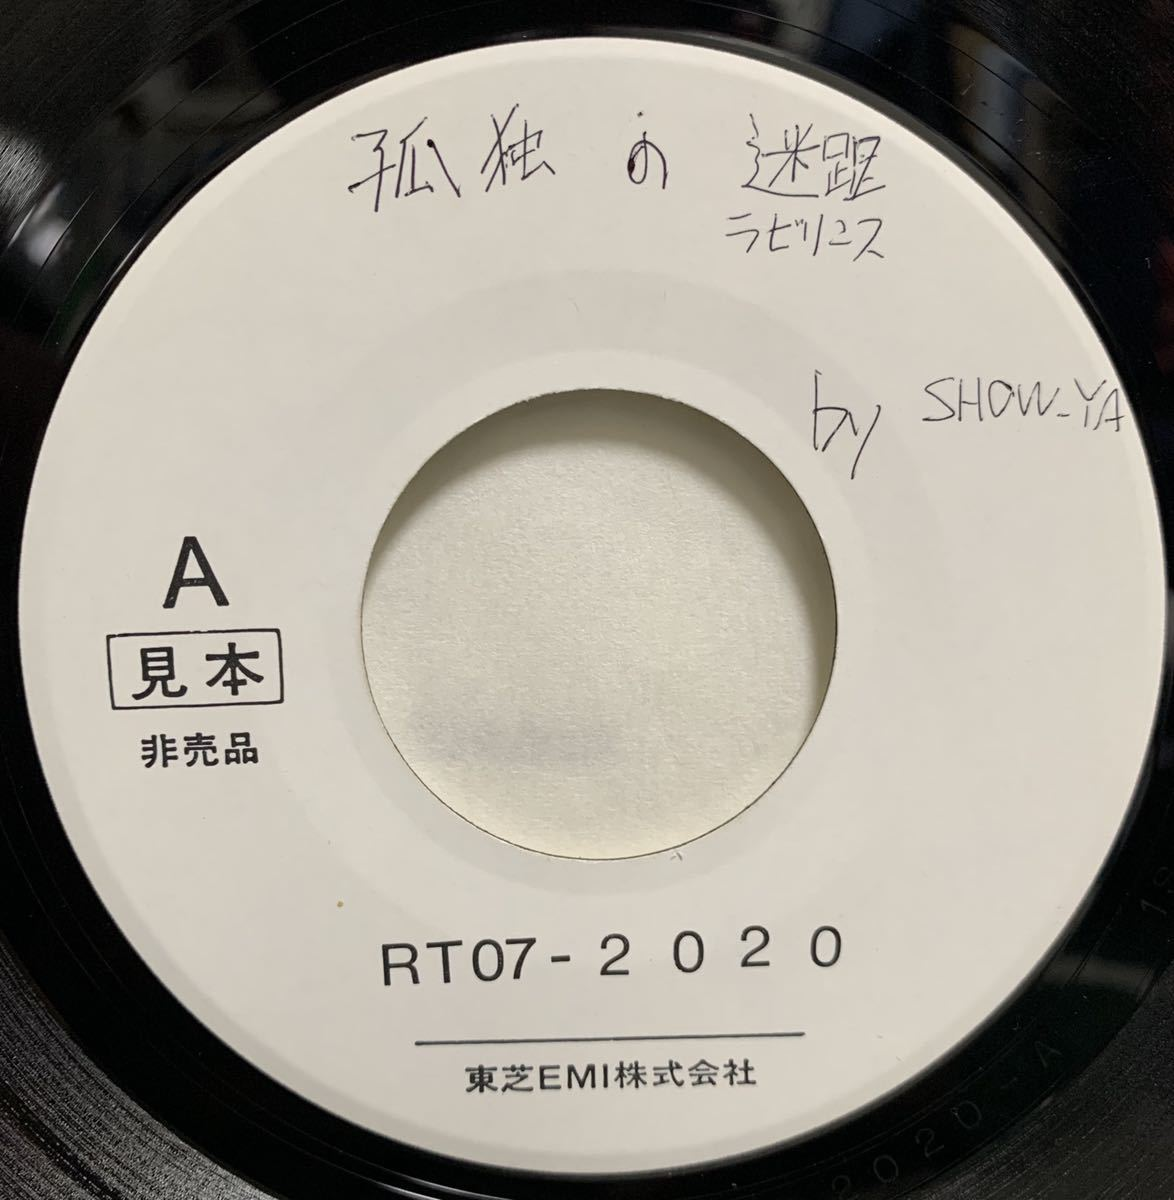 【EP】【7インチレコード】激レア 非売品 見本盤 プロモオンリー SHOW-YA / 孤独の迷路 CD移行期_画像4